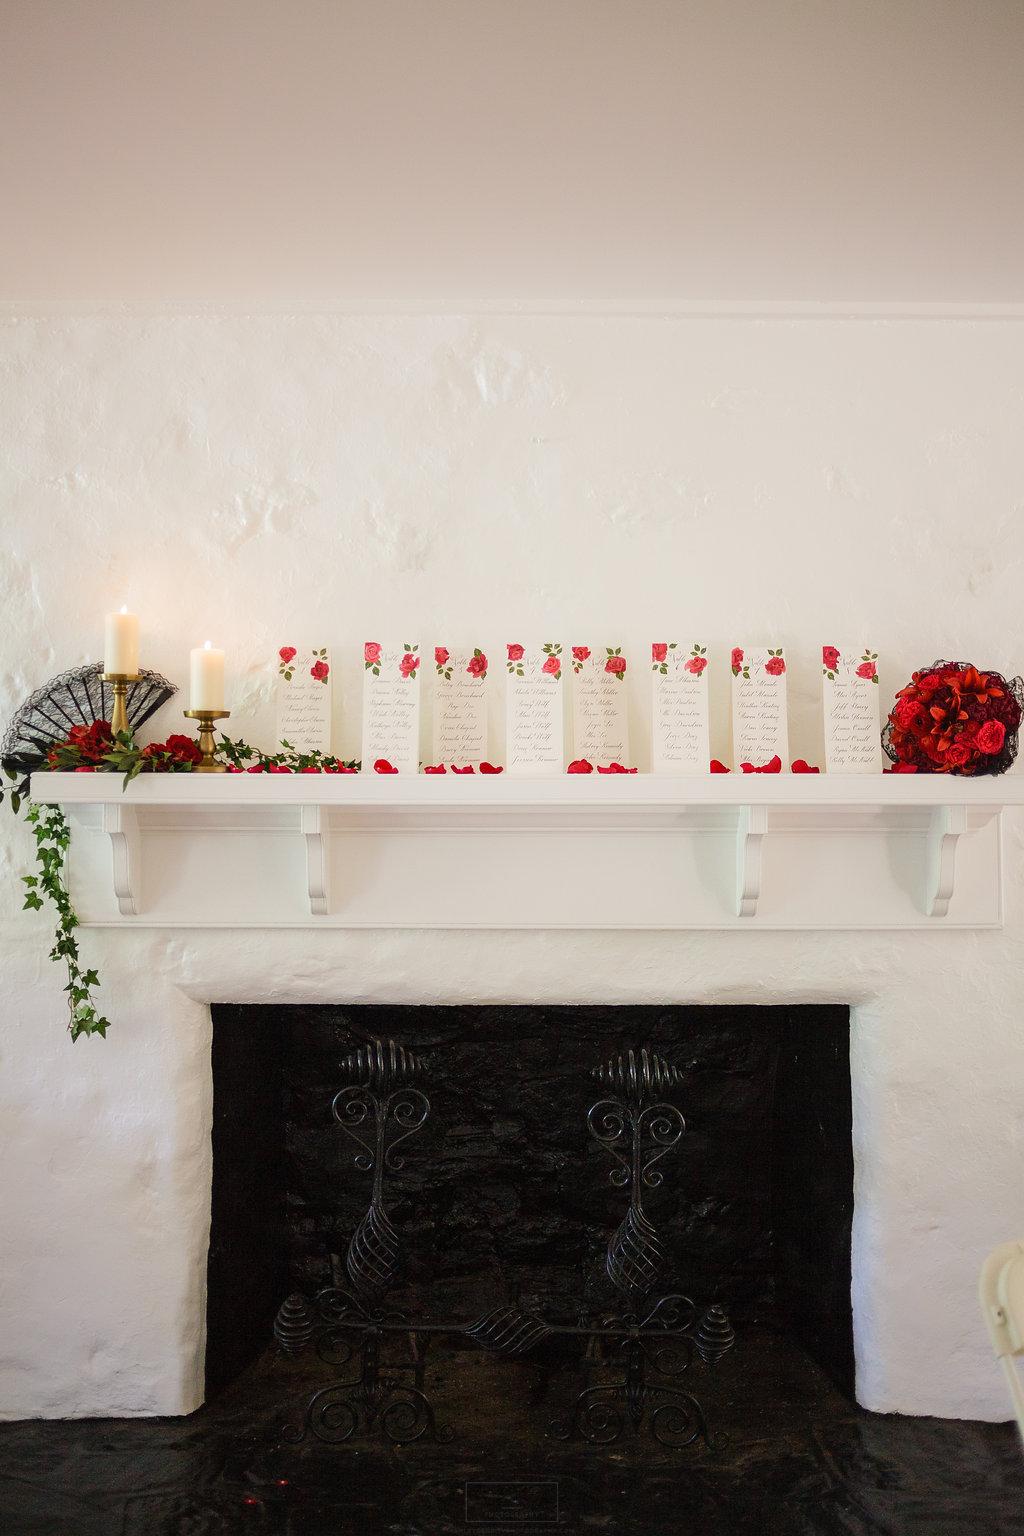 14 Spanish Rose Escort Card Wedding Mantel Decoration Philadelphia Wedding Planner Bolingbroke Mansion.jpg